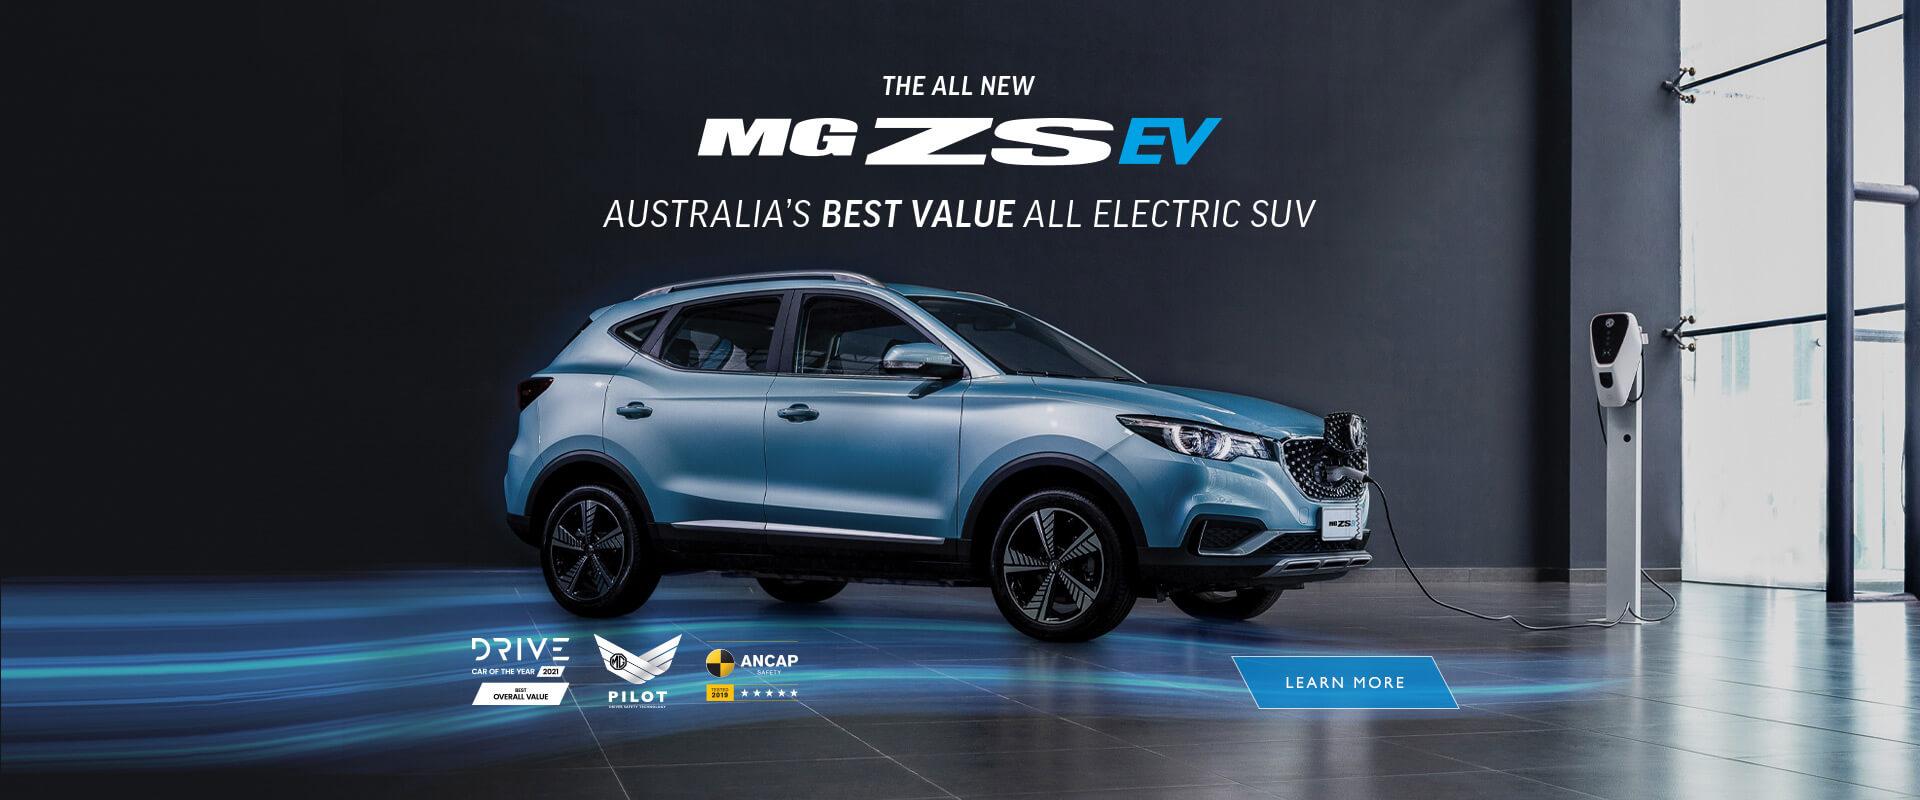 MG ZS EV. Australia's best value all electric SUV.